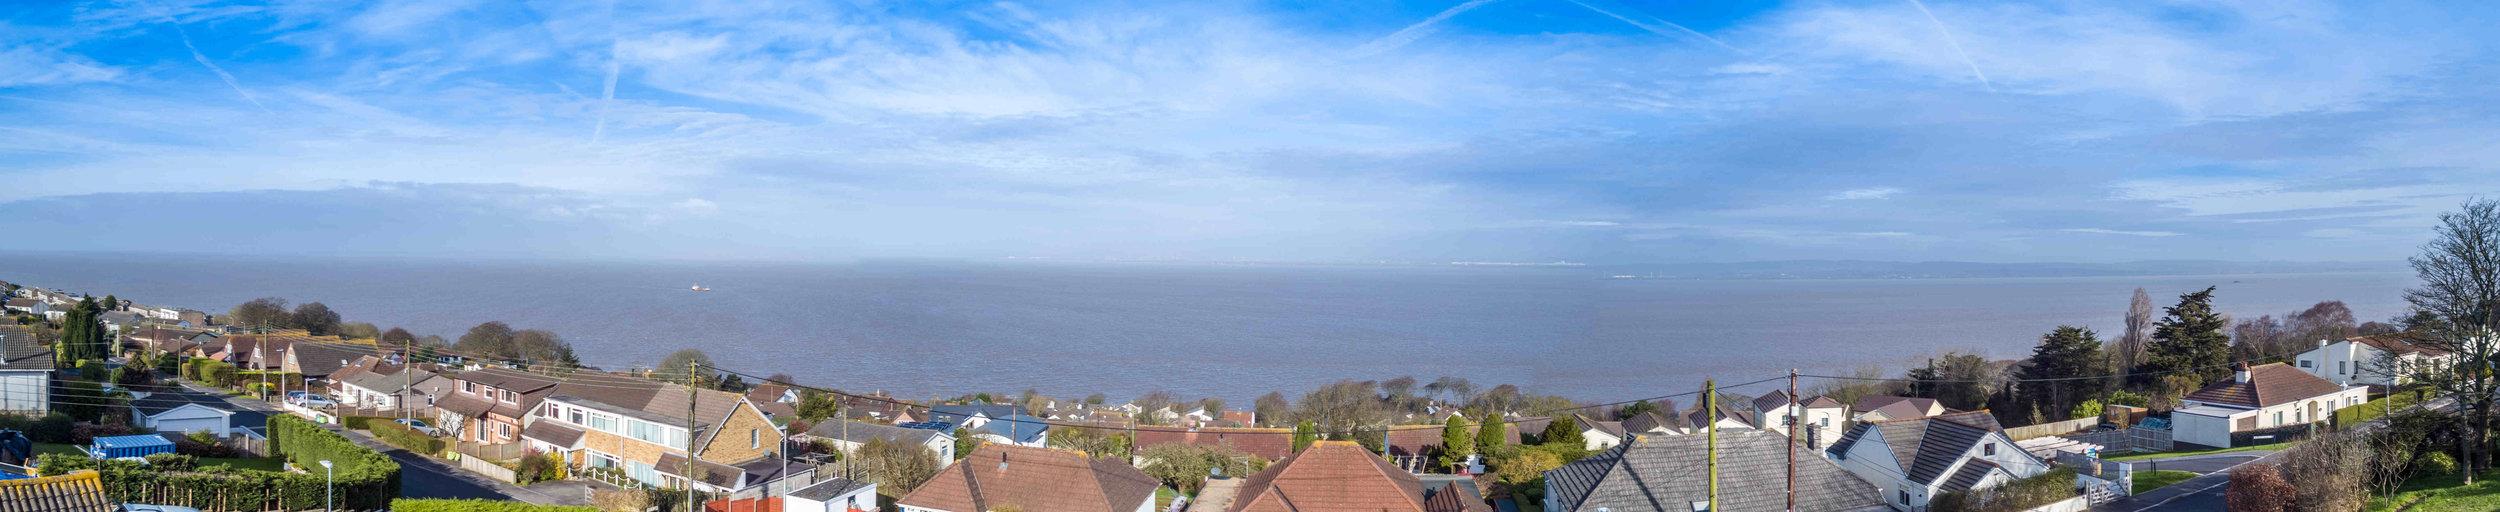 Hillcrest Panoramic View.jpg